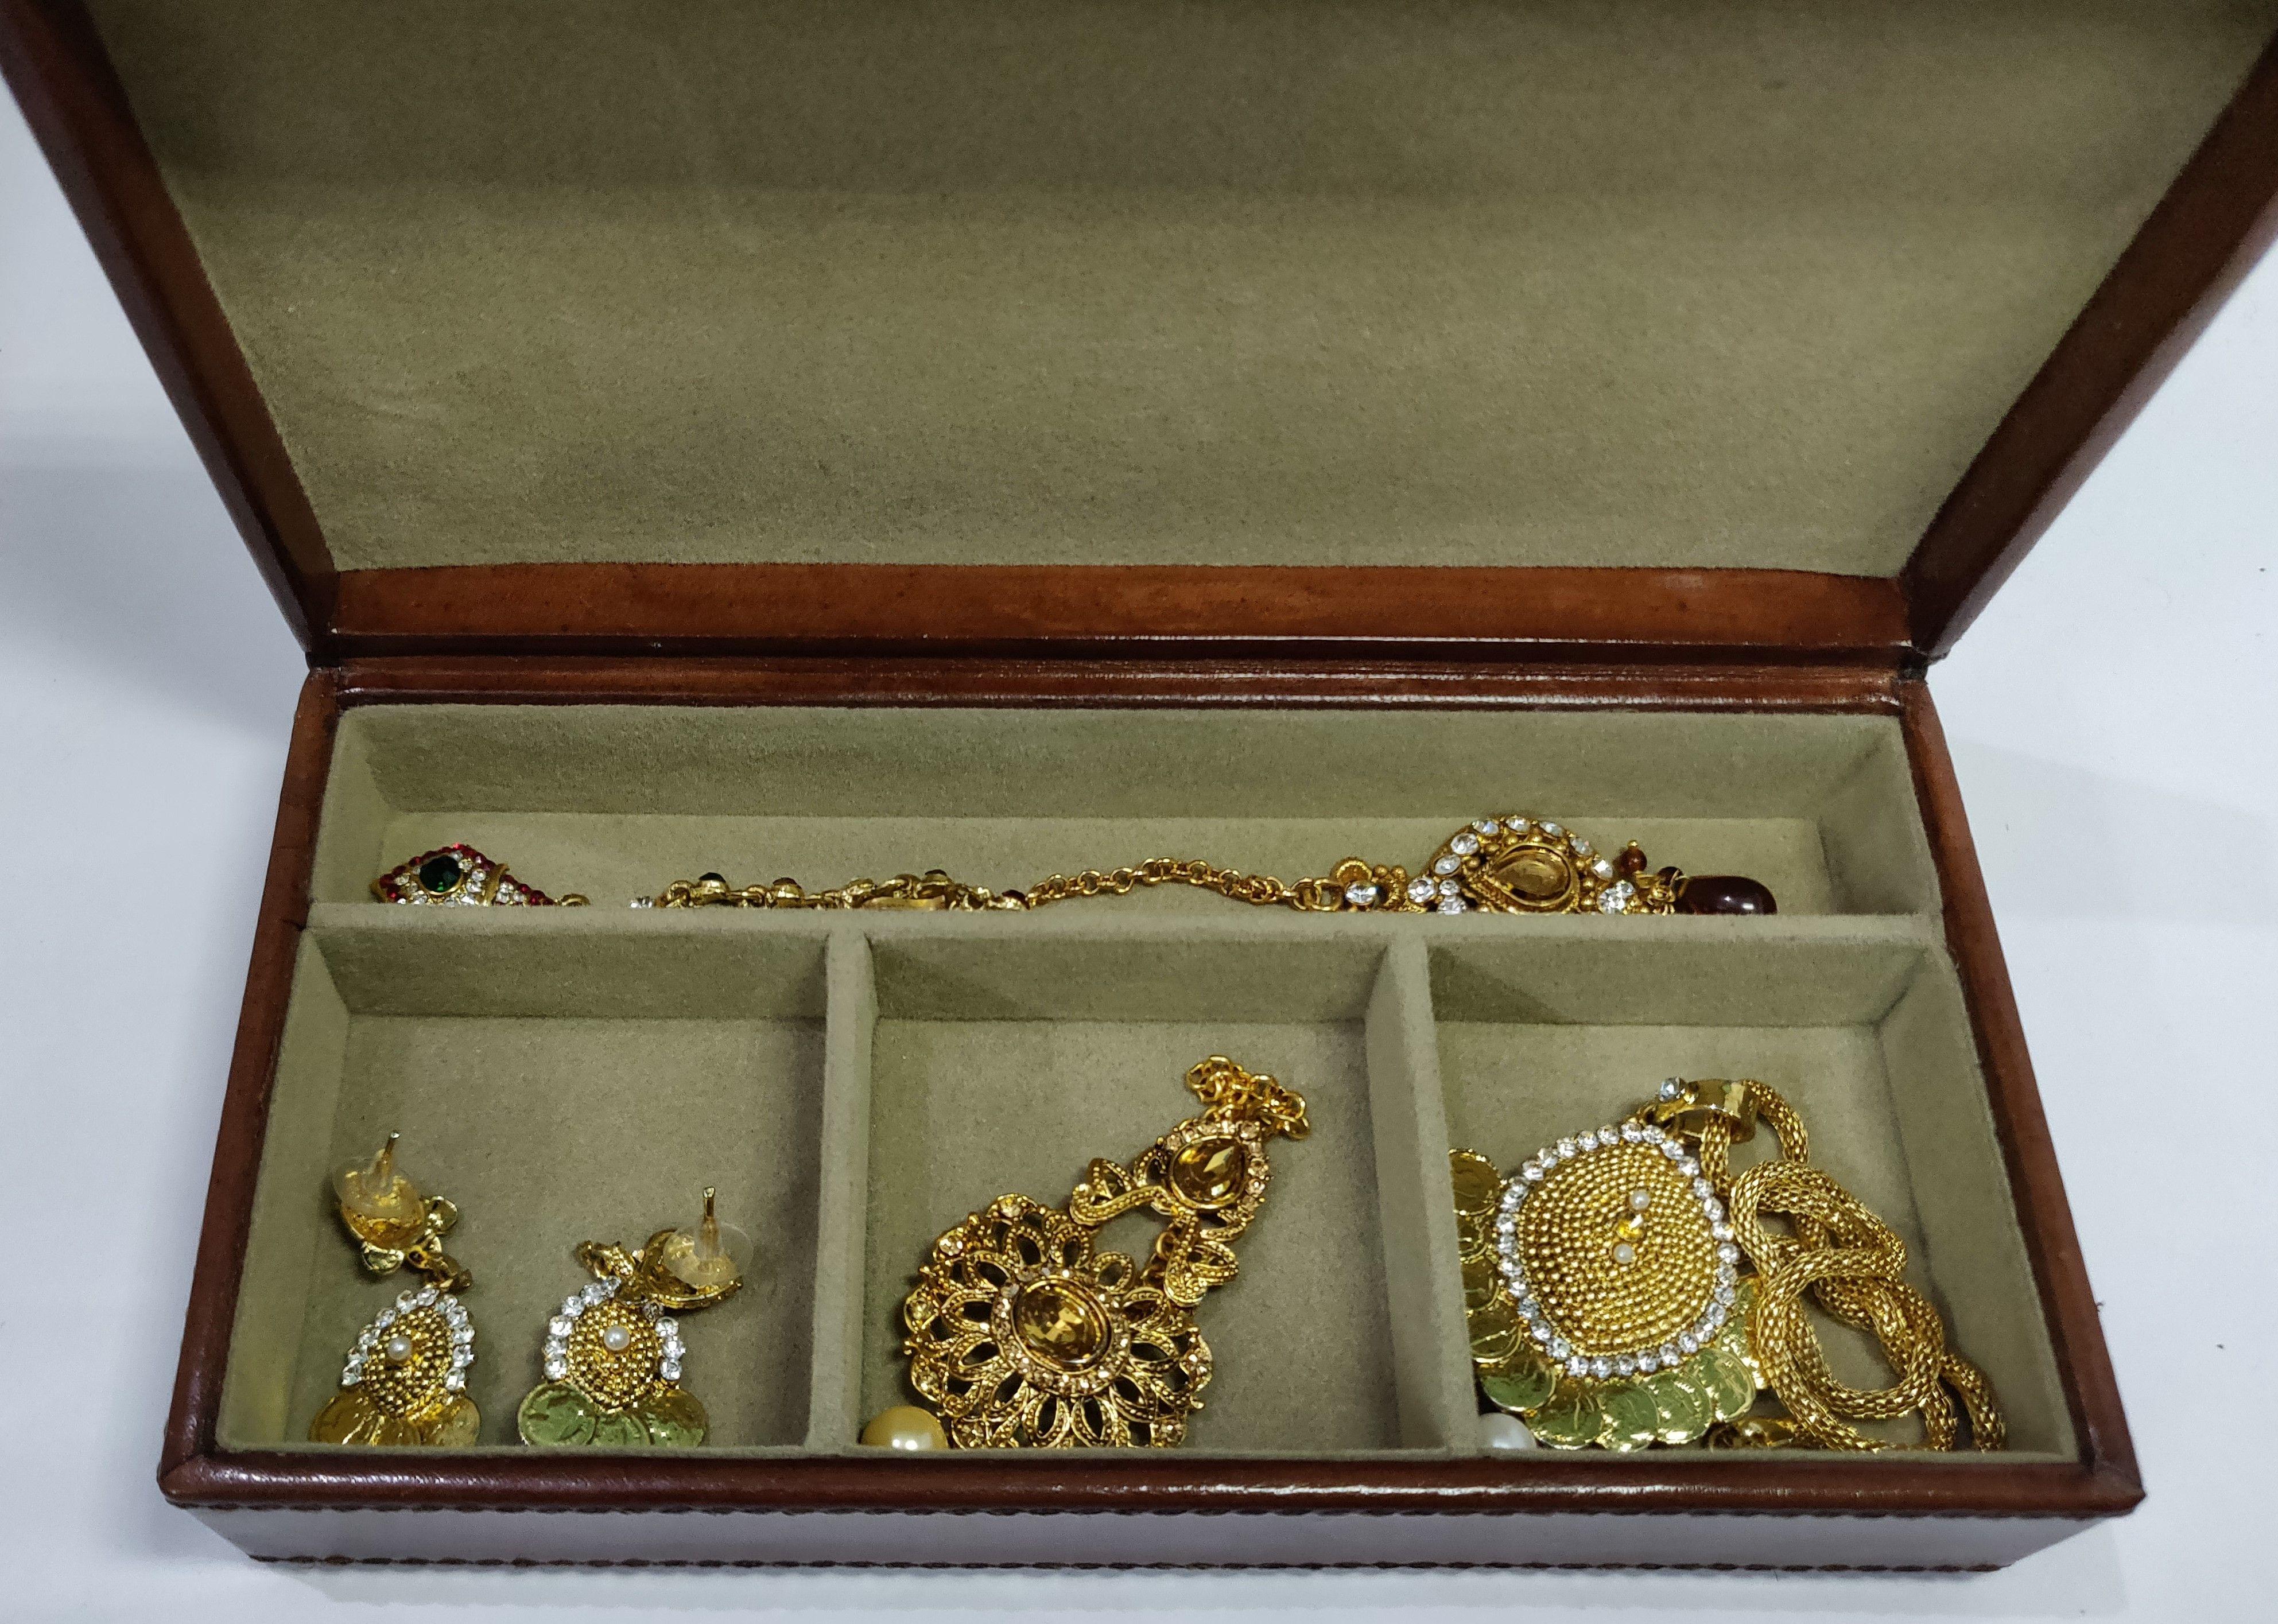 Genuine Leather Jewellery Box Made By Genuine Leather Handmade